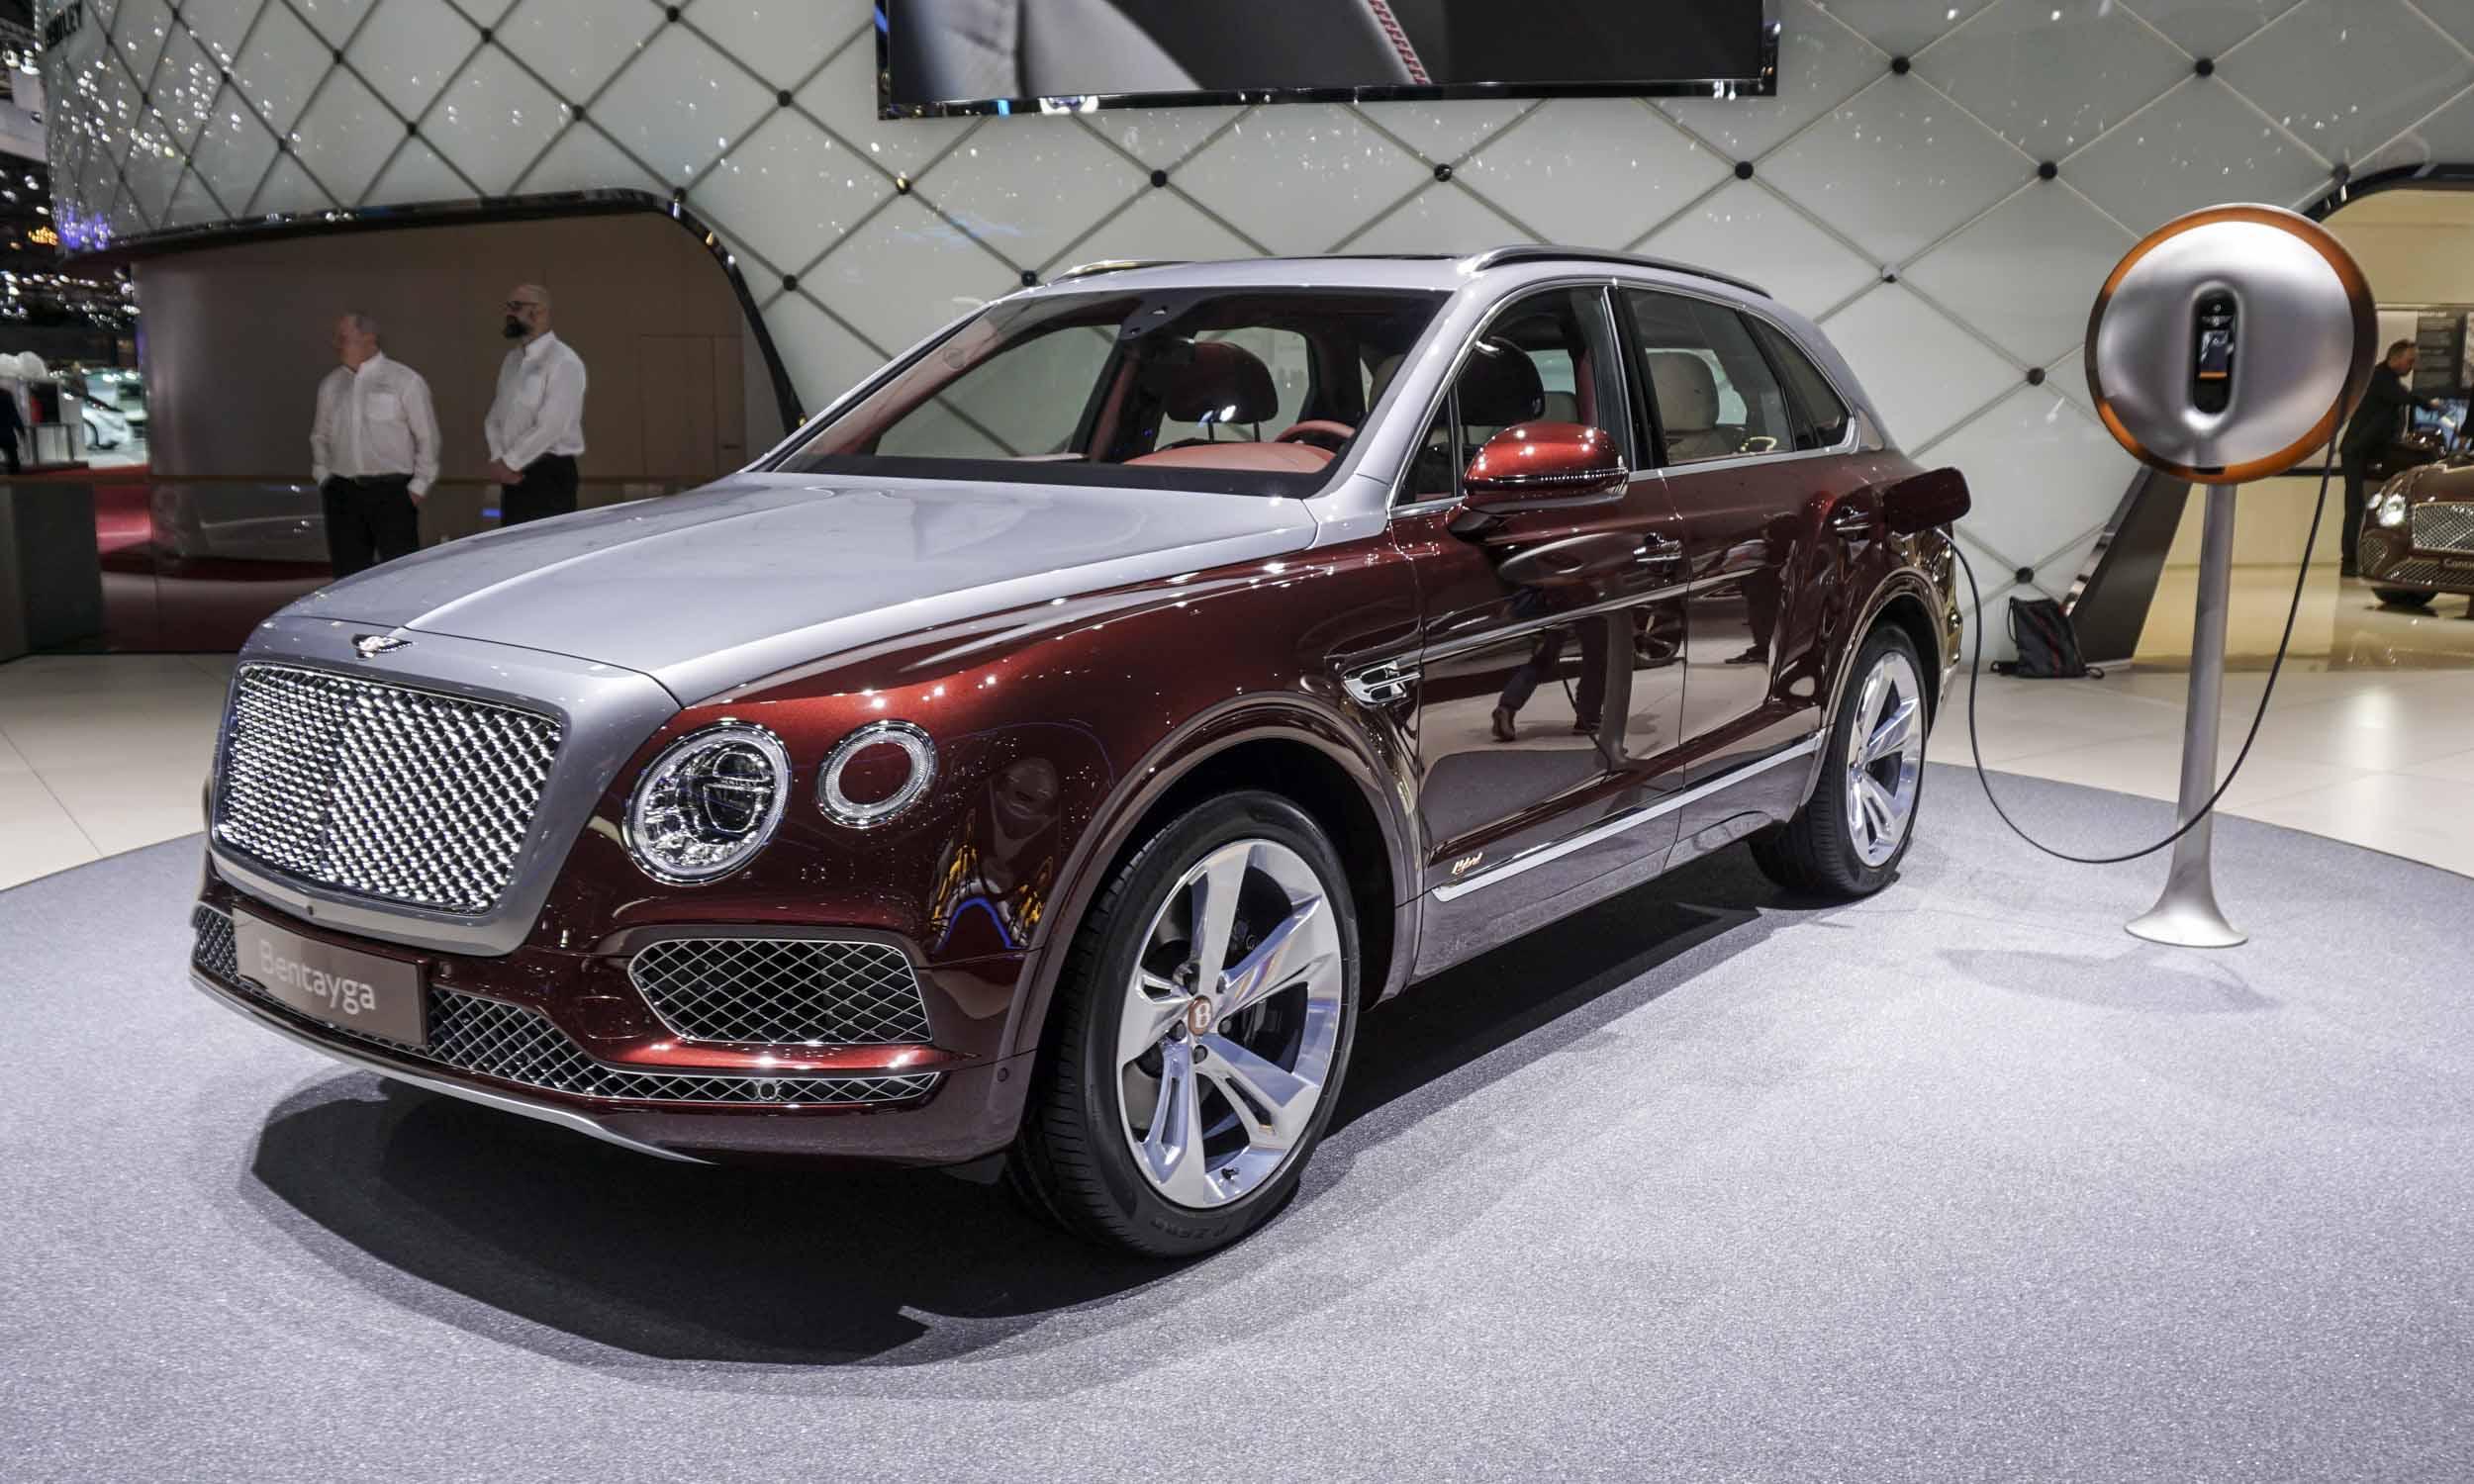 2018 geneva motor show luxury cars autonxt. Black Bedroom Furniture Sets. Home Design Ideas